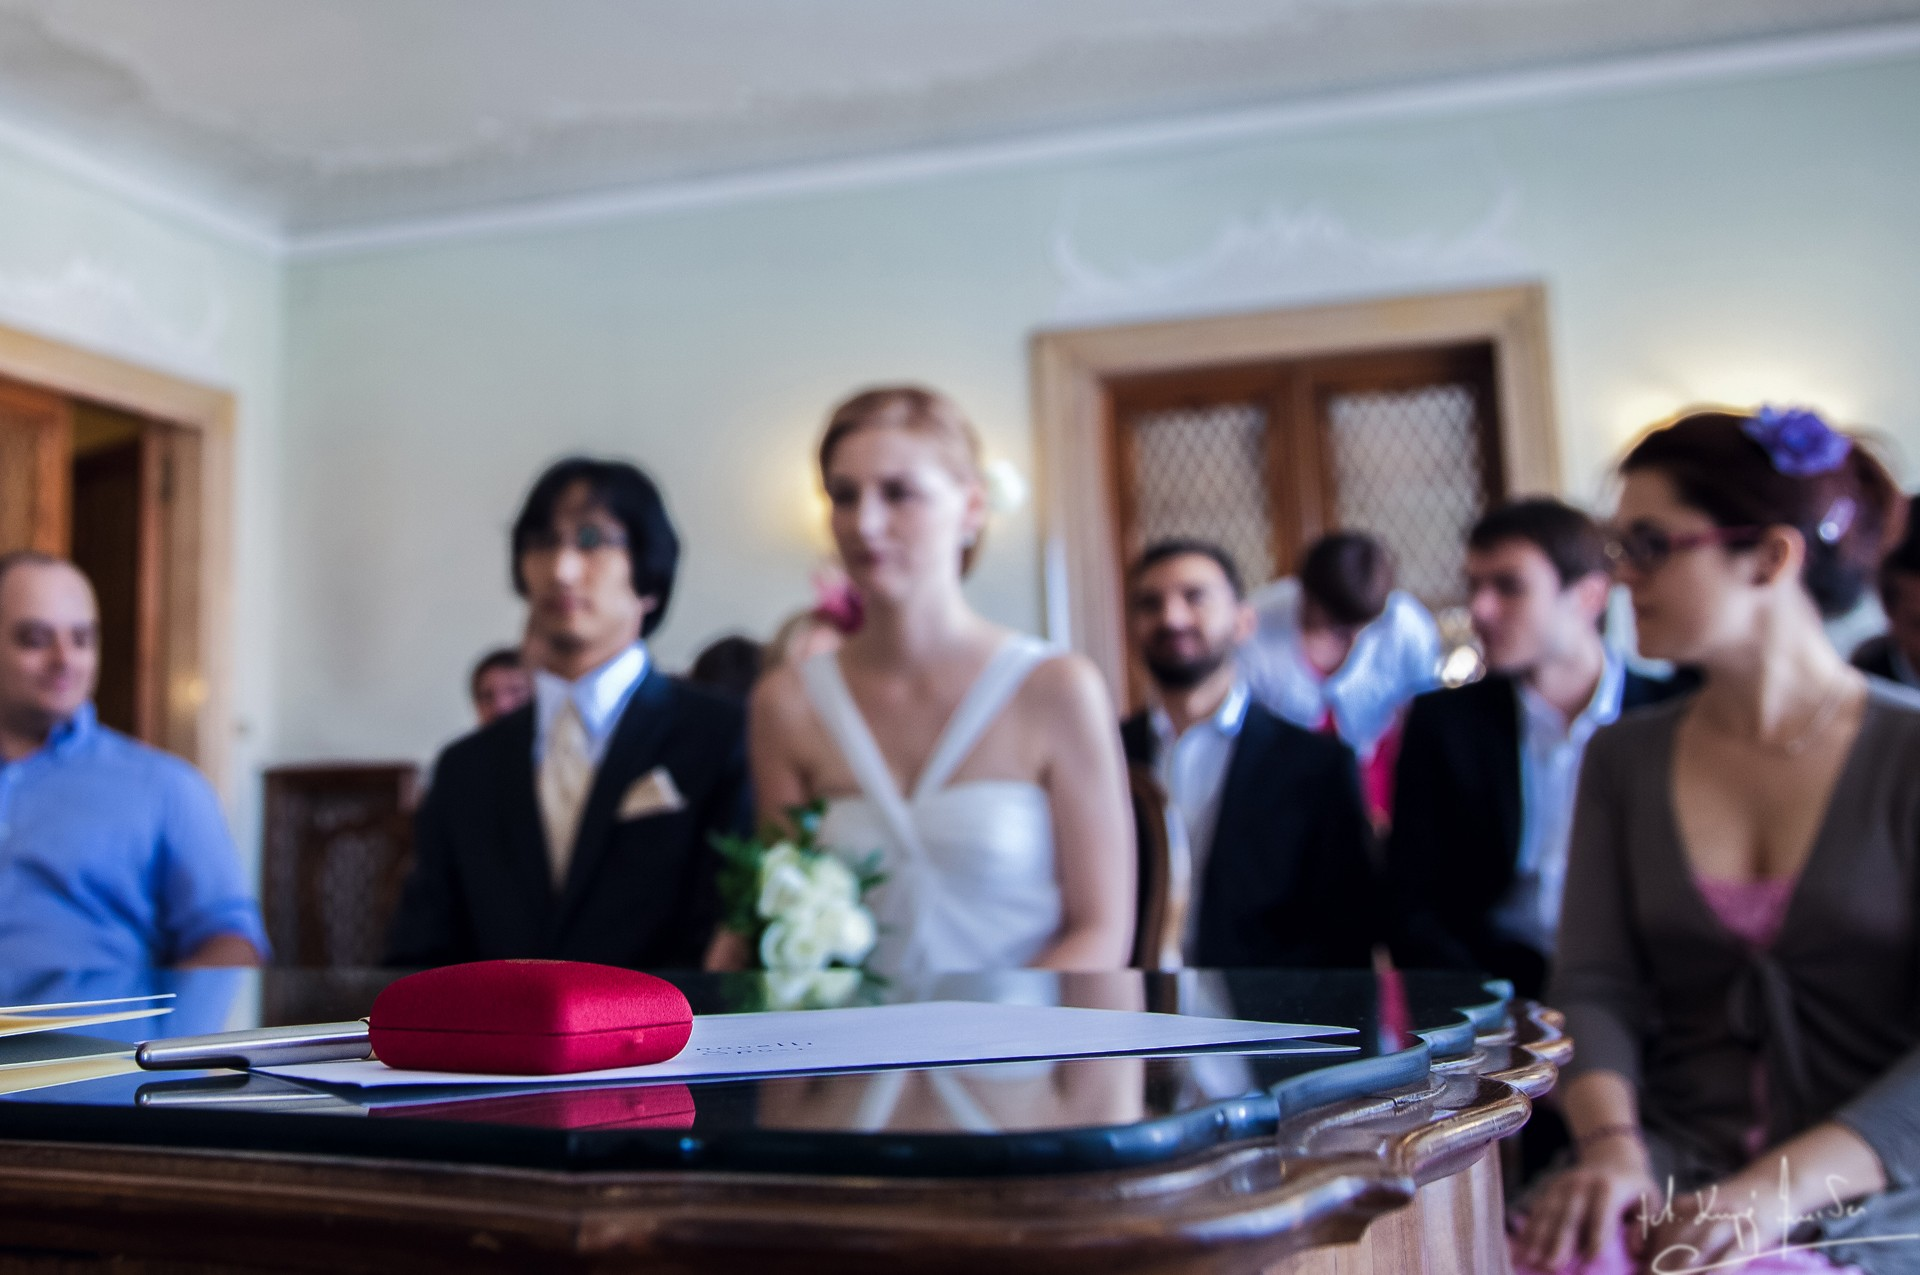 Ślub w wenecji 33 Manuela Luiza & Young Seon Song